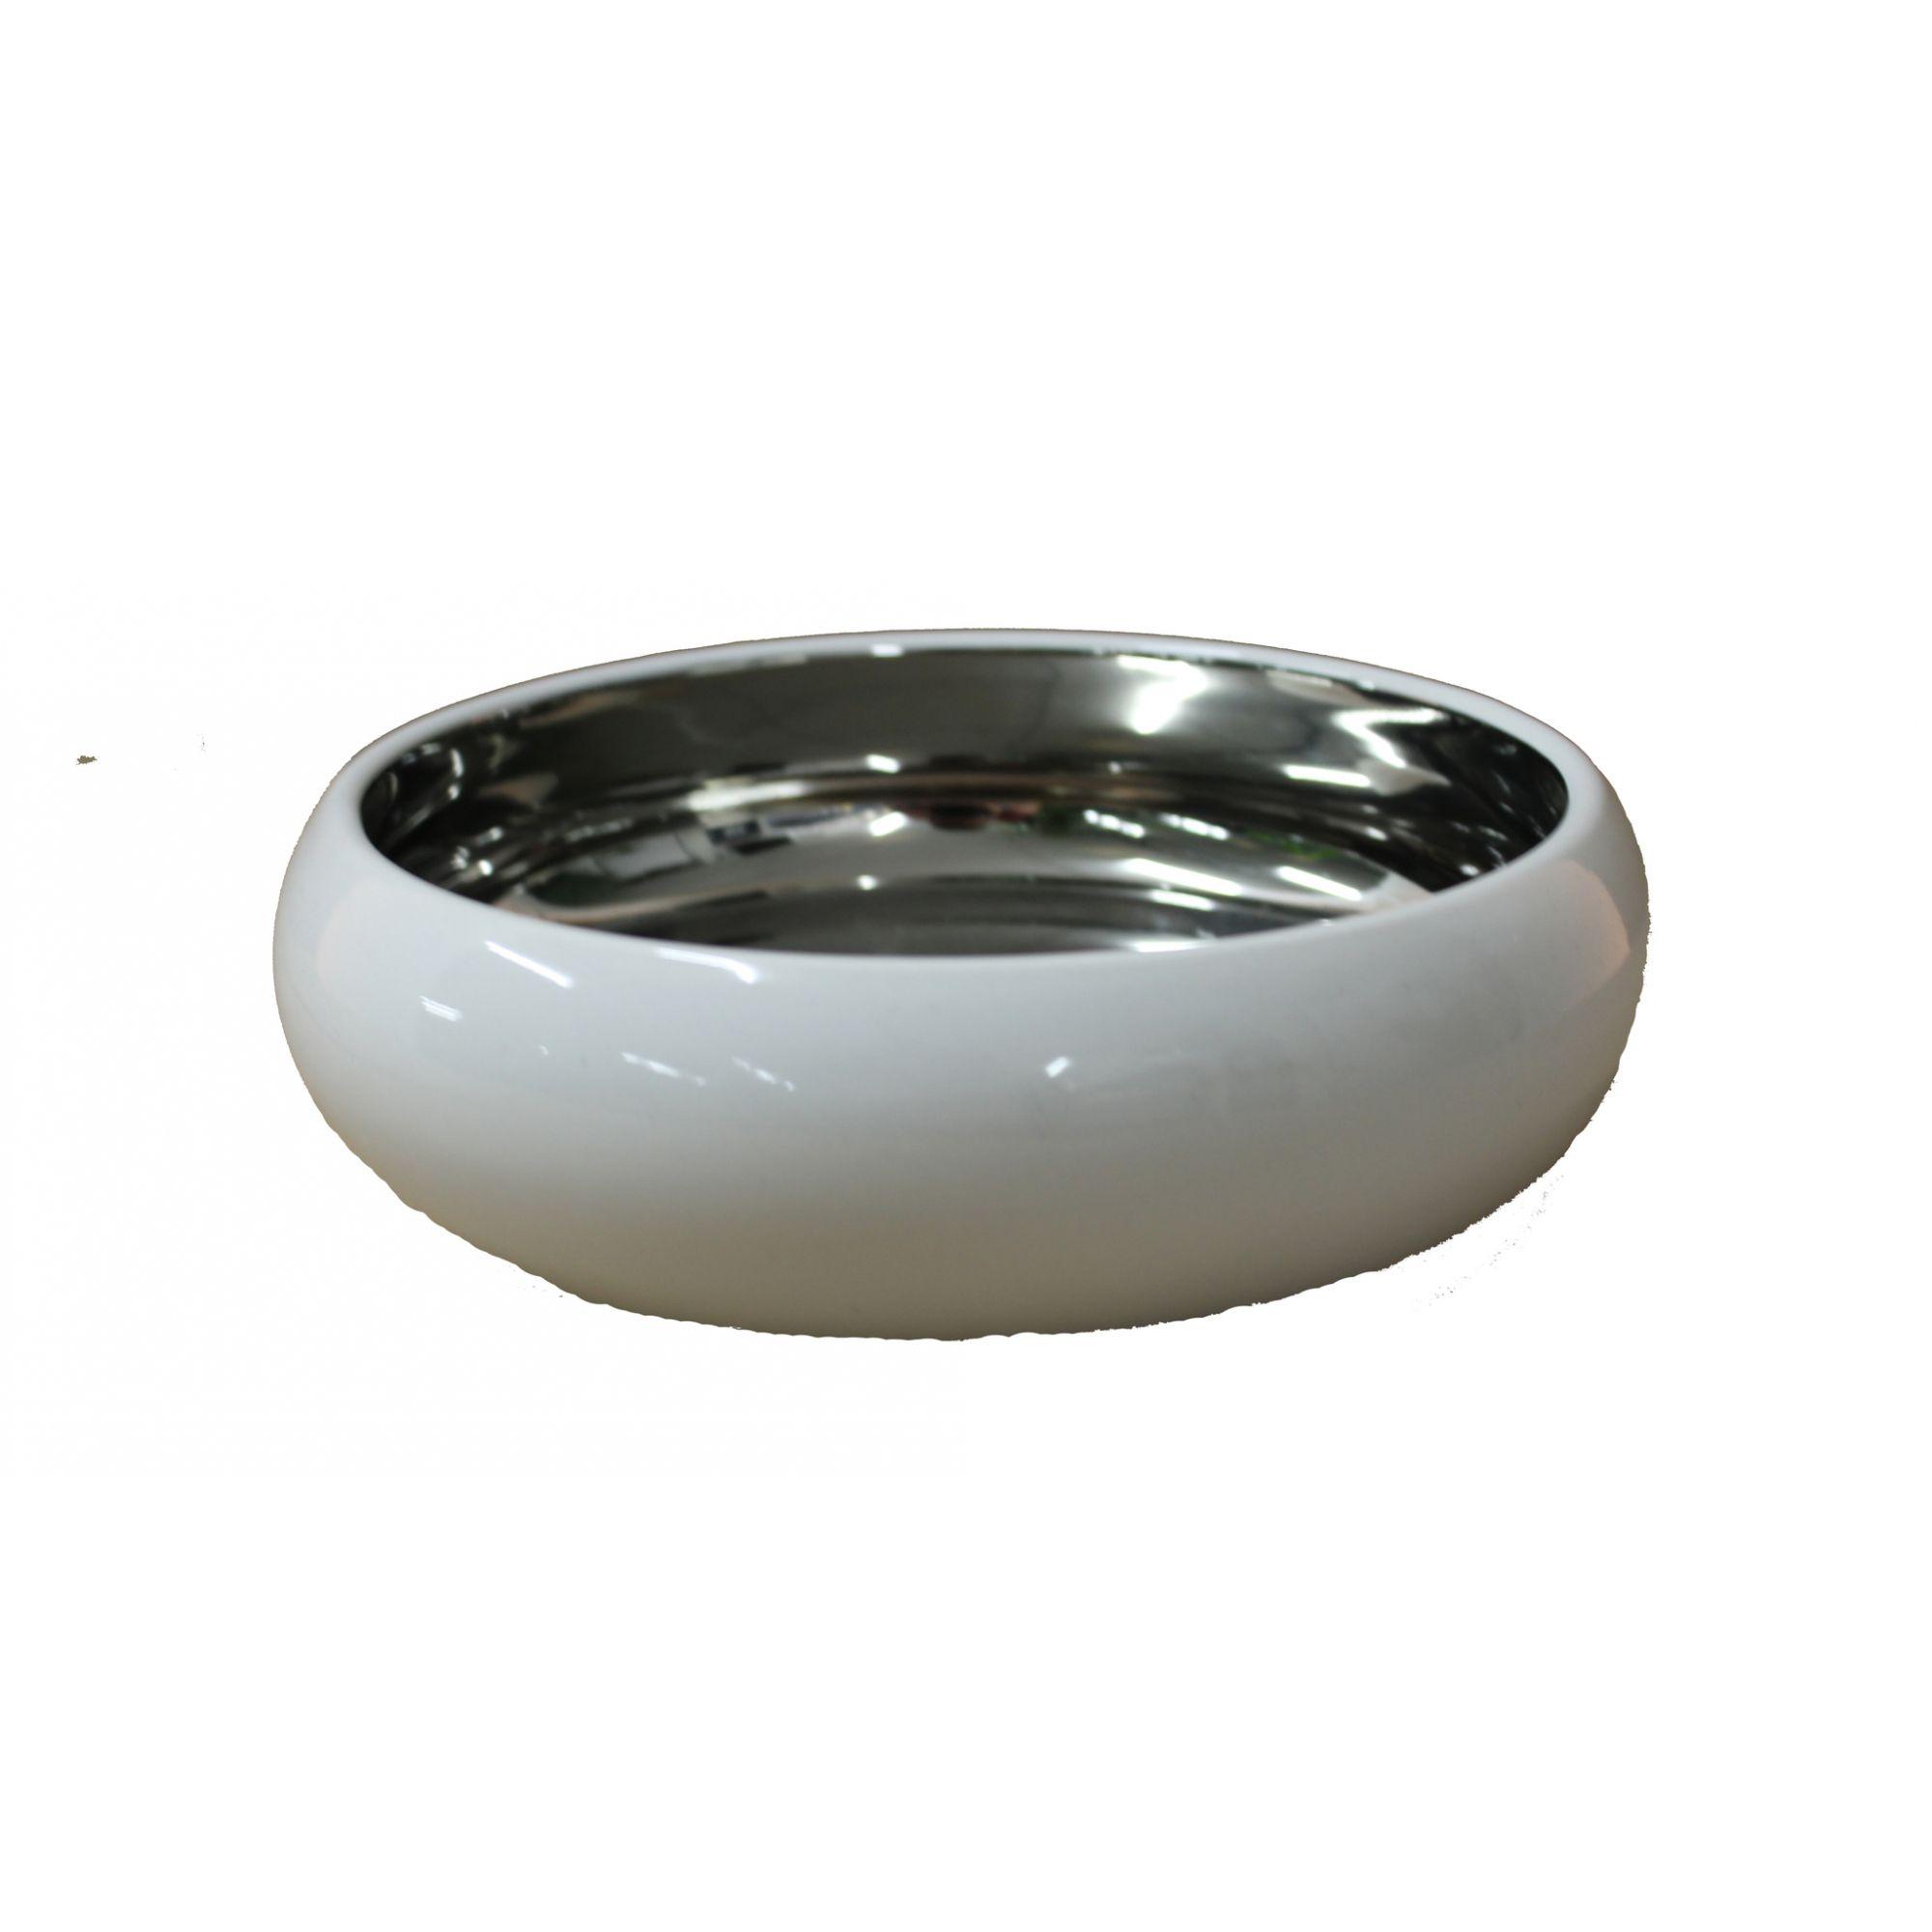 Vaso Decorativo De Ceramica